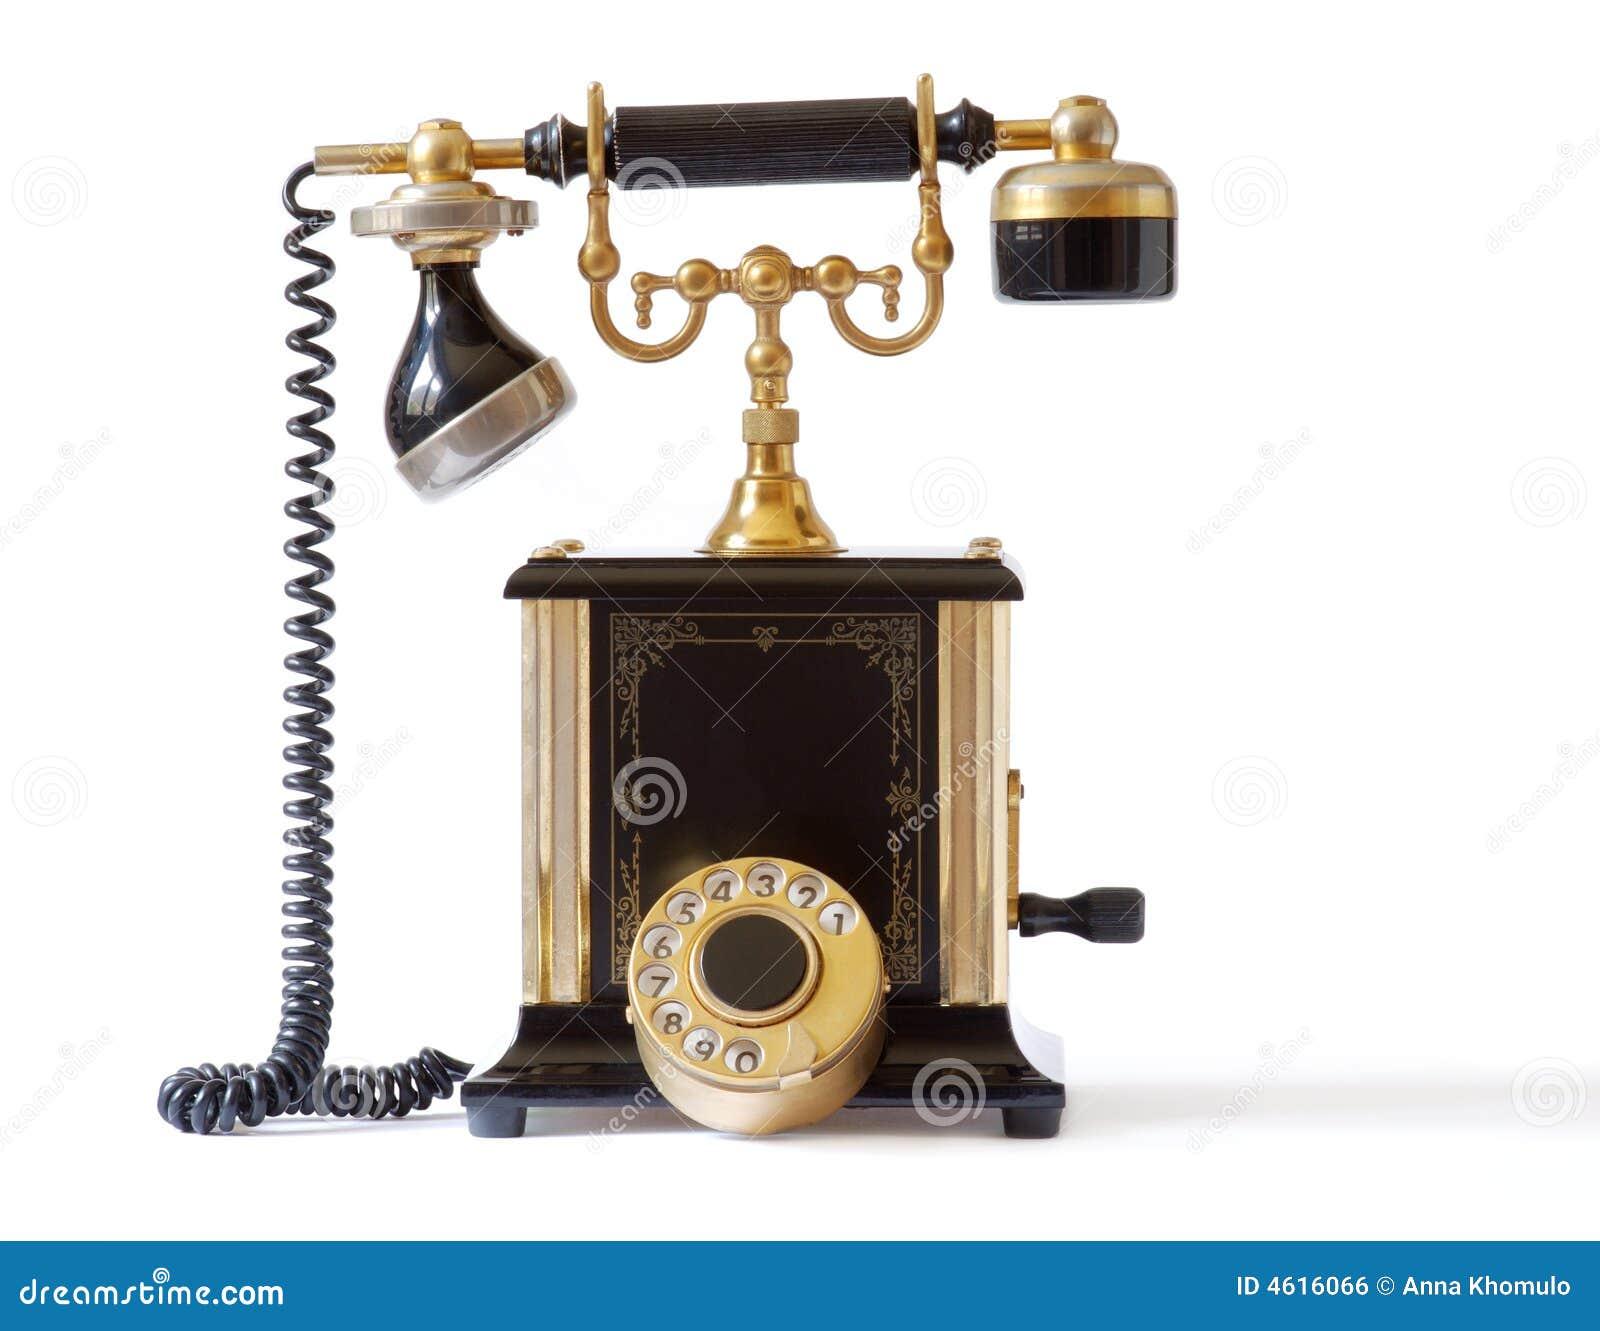 ... Telefoon Royalty-vrije Stock Afbeelding - Afbeelding: 4616066: nl.dreamstime.com/royalty-vrije-stock-afbeelding-ouderwetse...